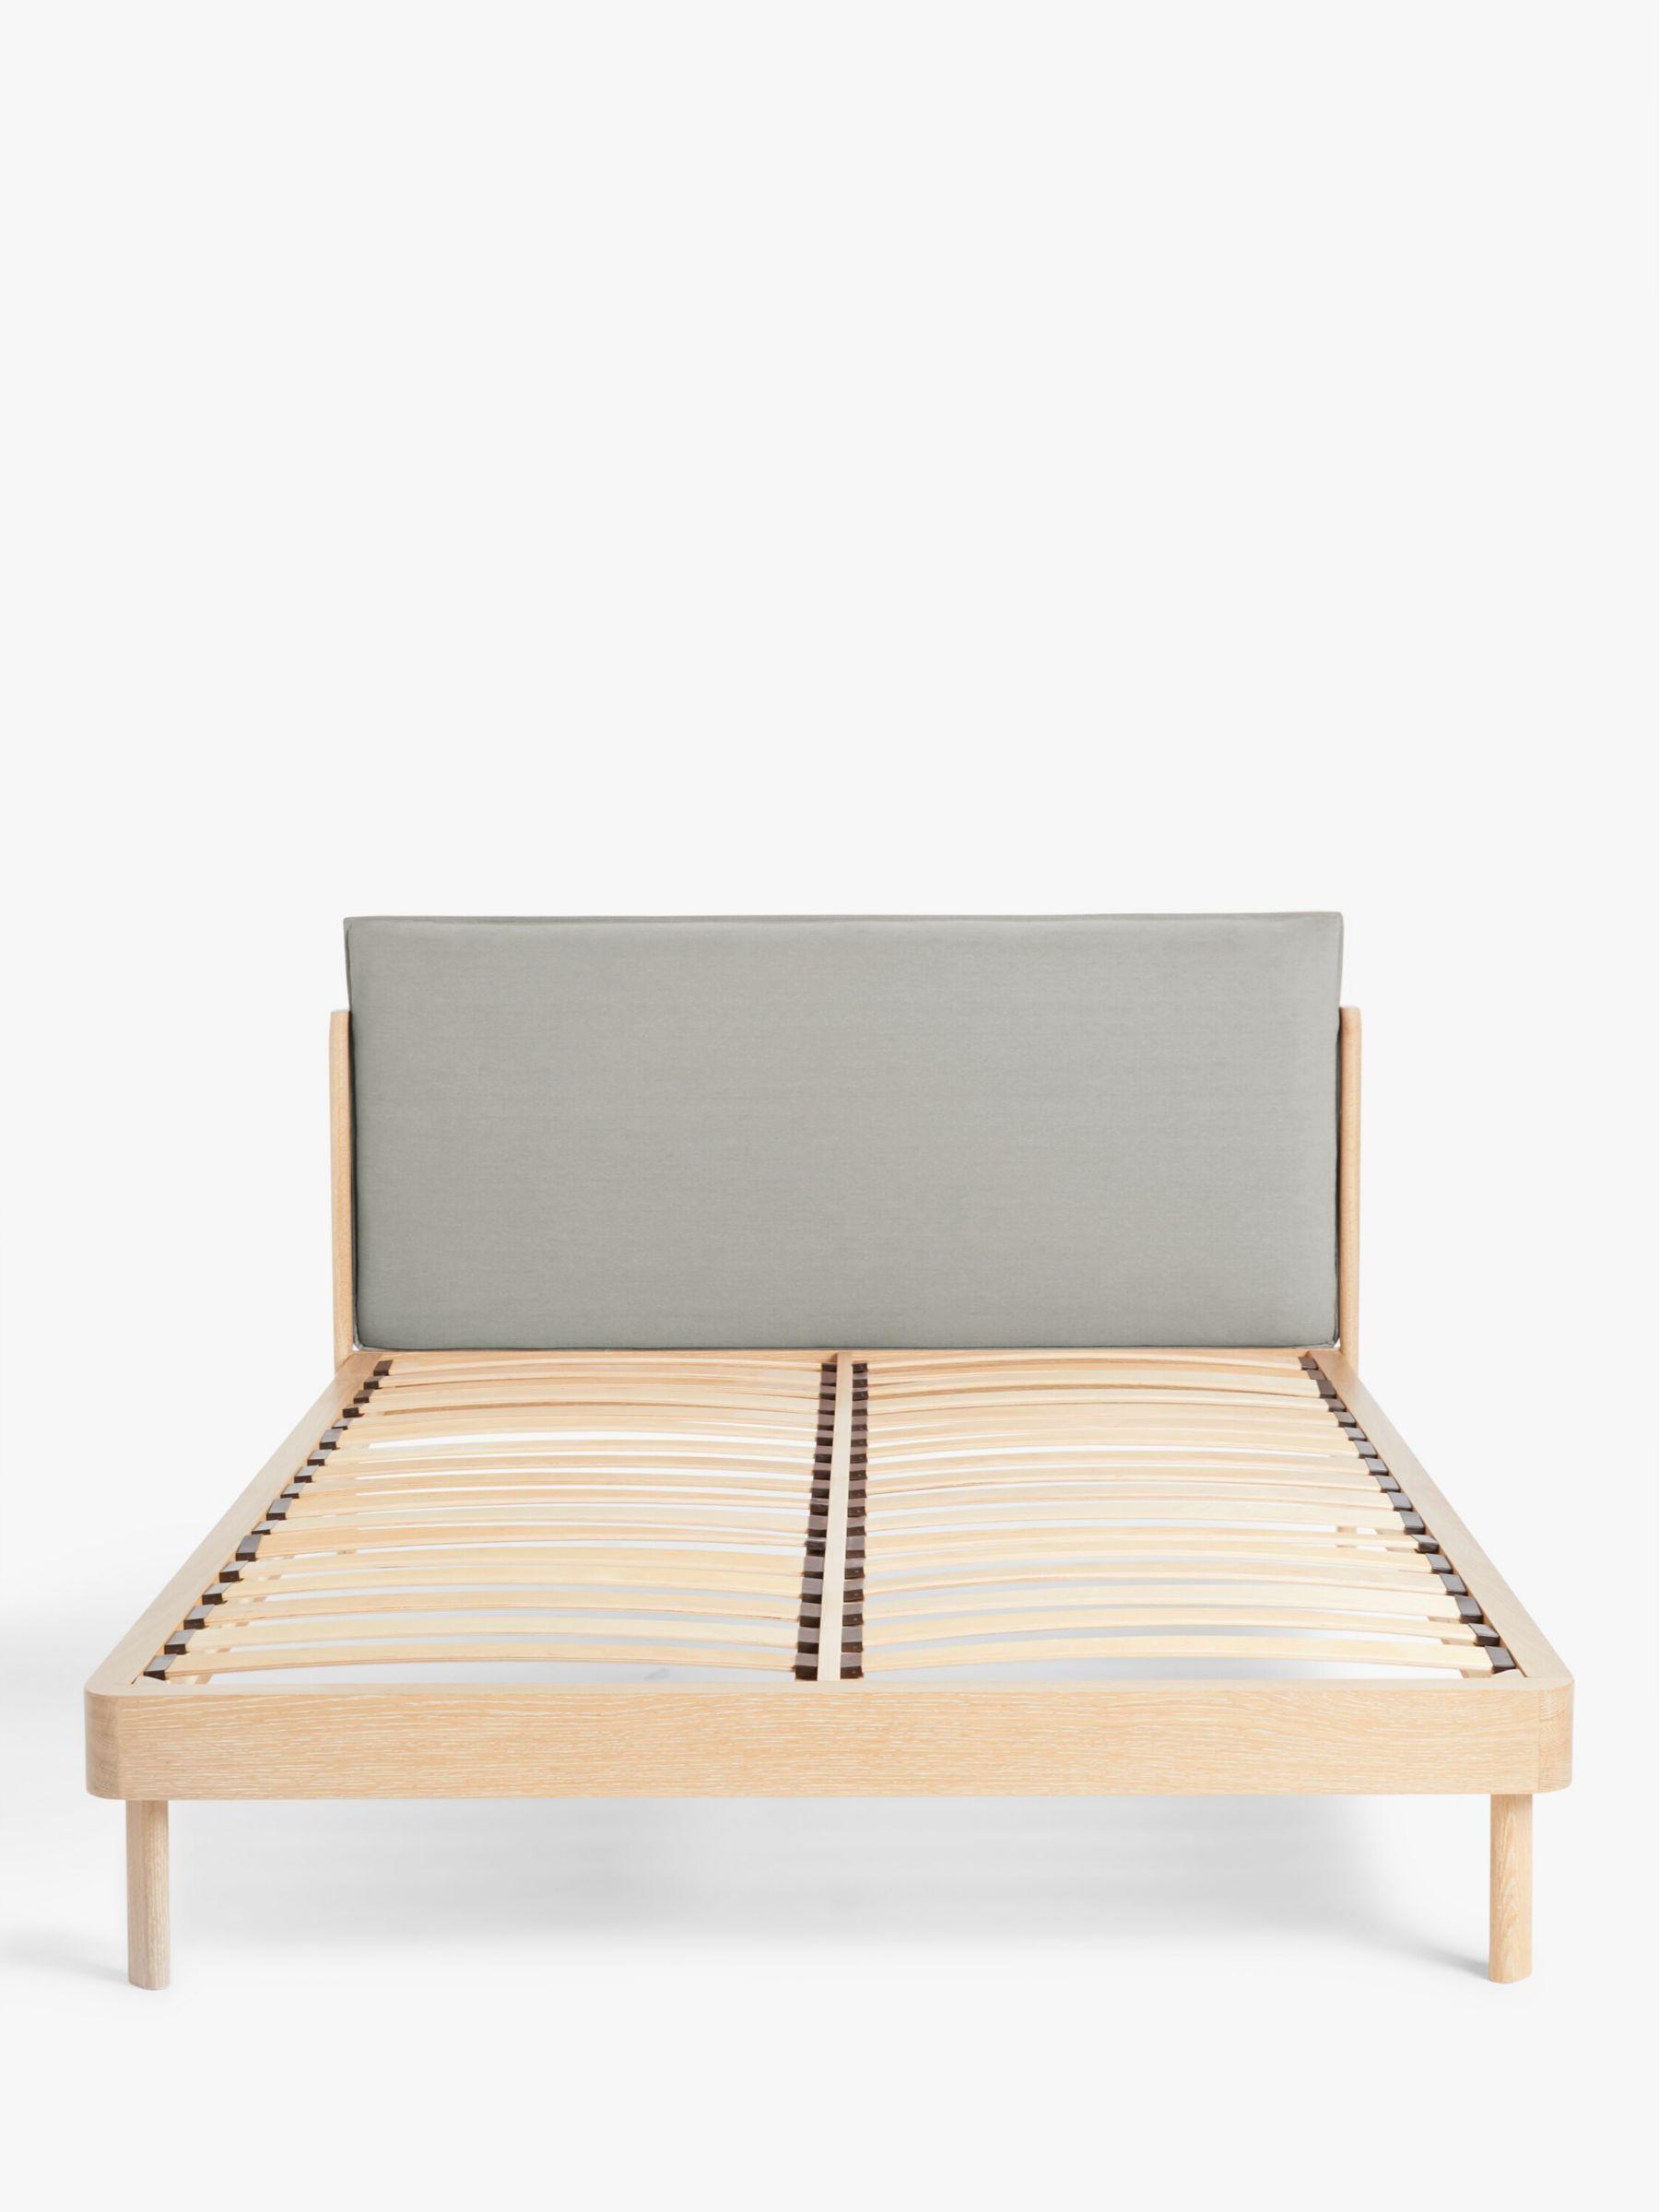 John Lewis Partners Pillow Bed Frame King Size Bed Pillows Bed Frame King Size Bed Frame